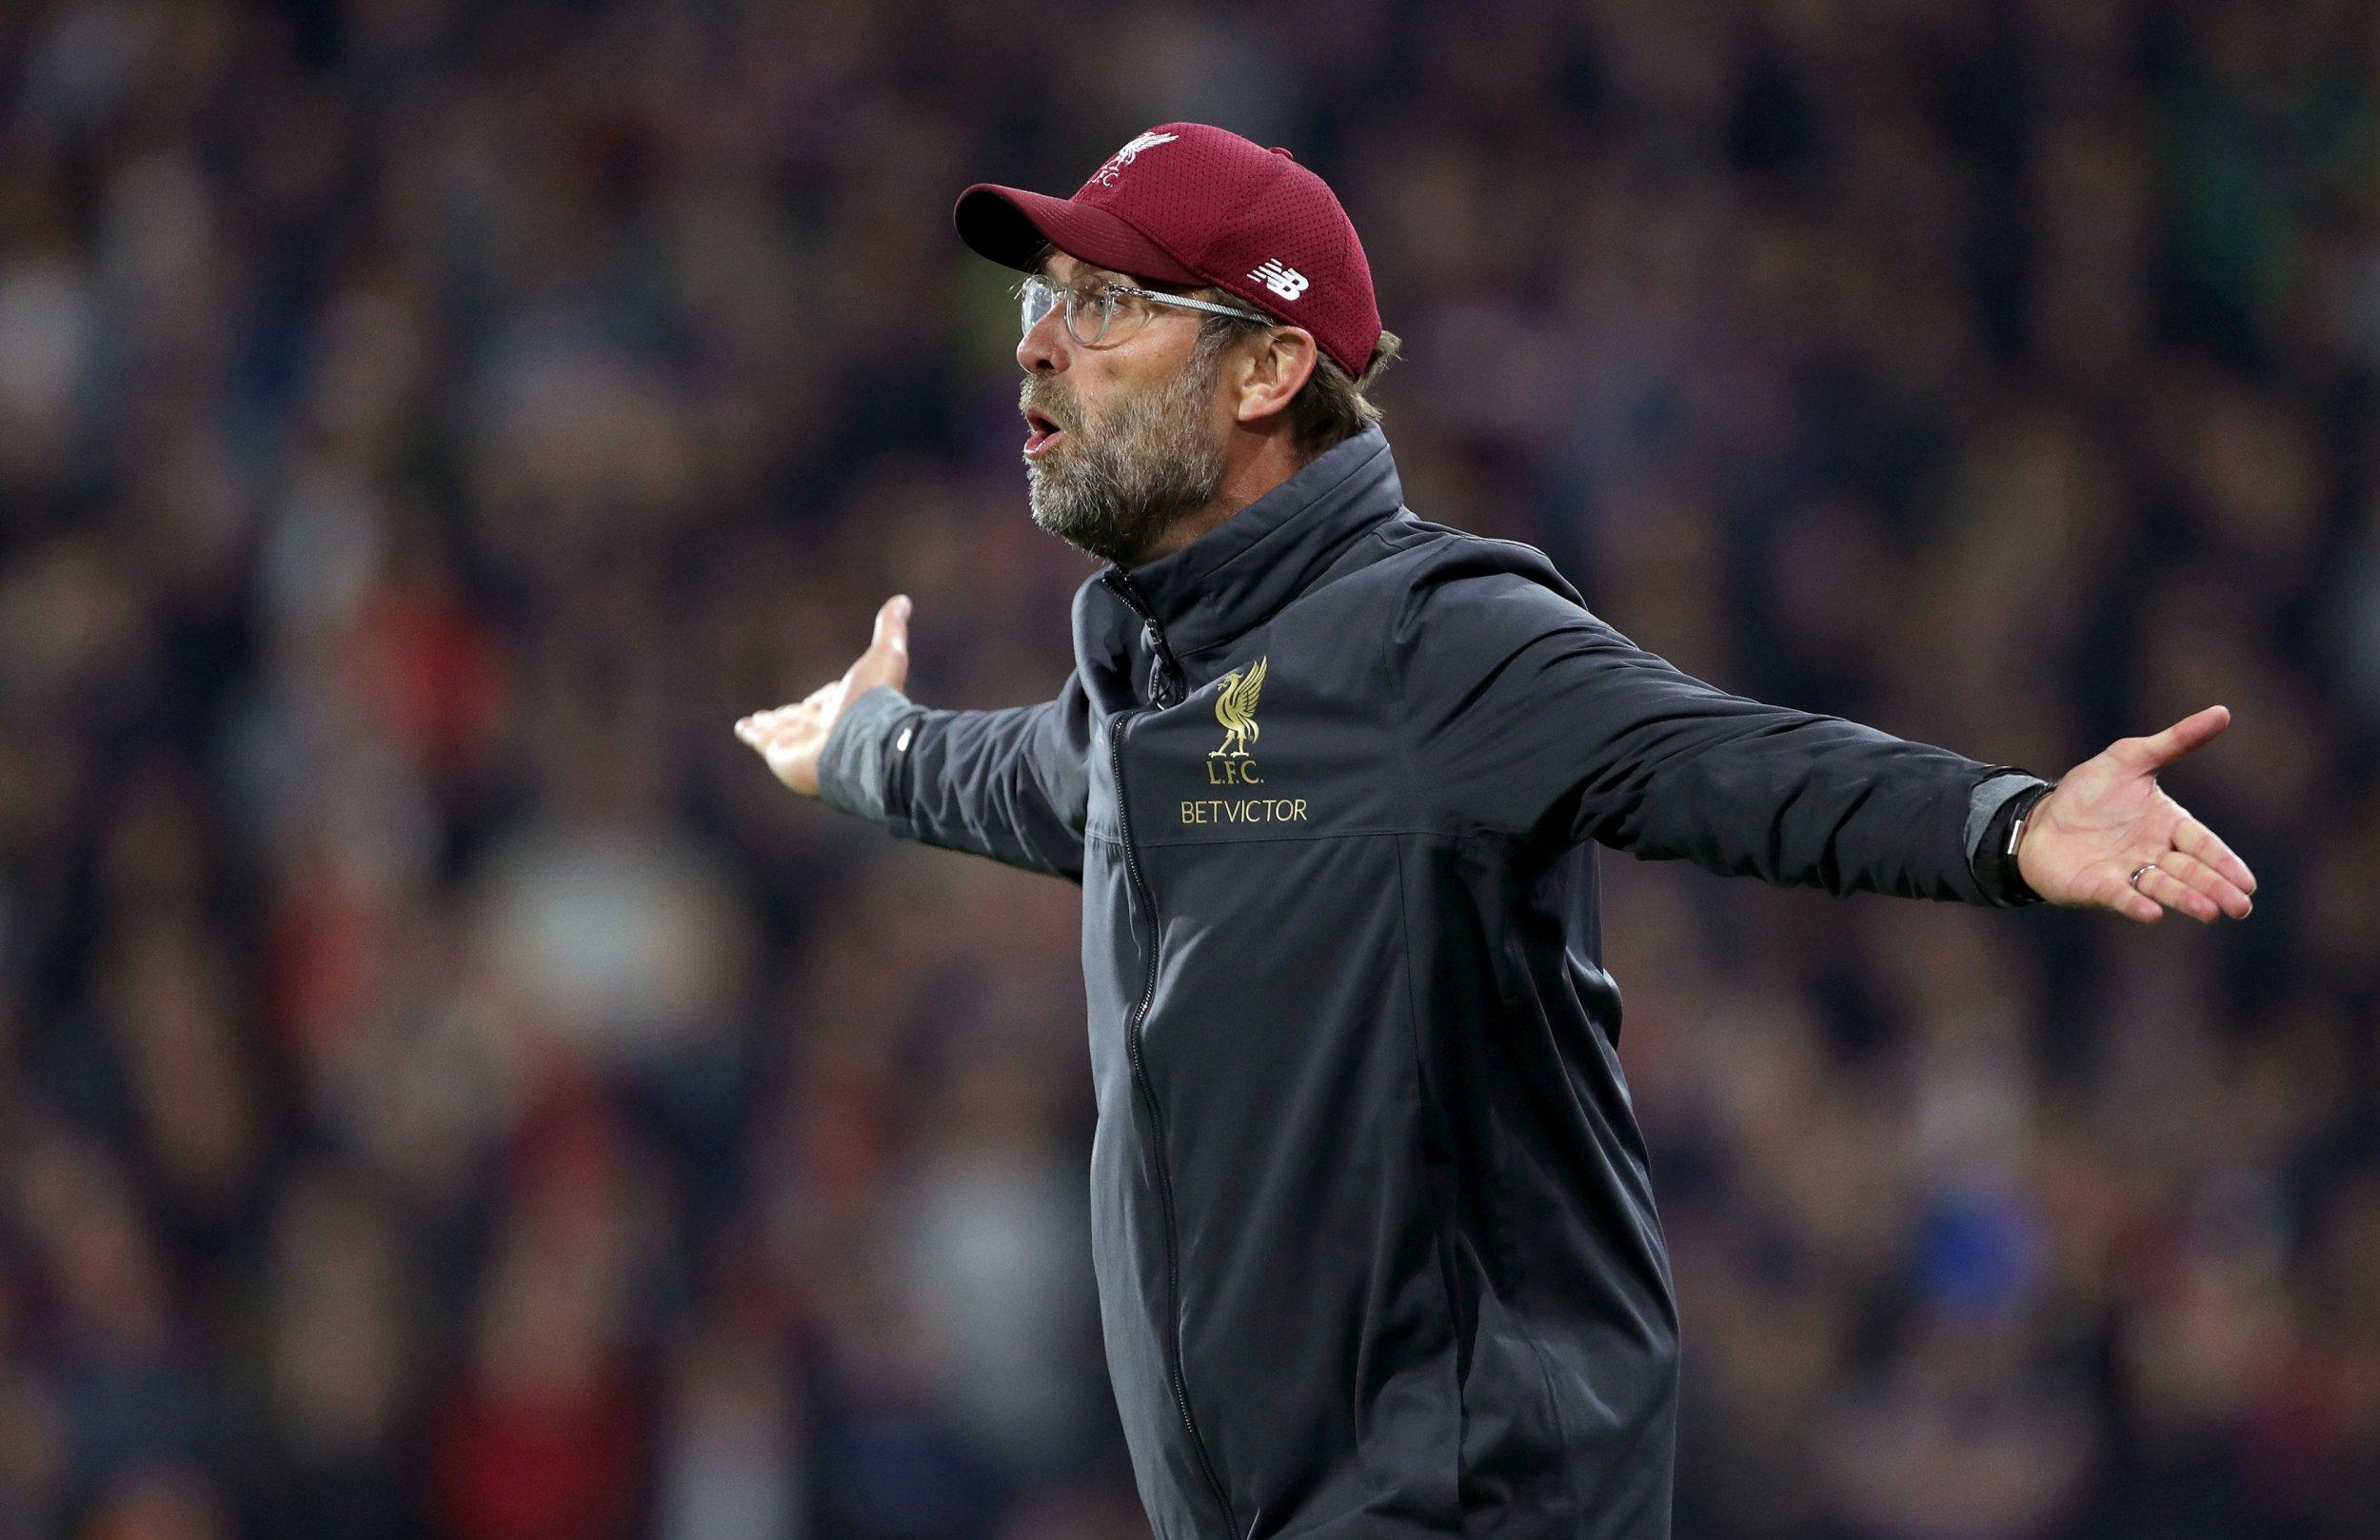 Xherdan Shaqiri reveals Jurgen Klopp's fury at Liverpool players after win vs Huddersfield